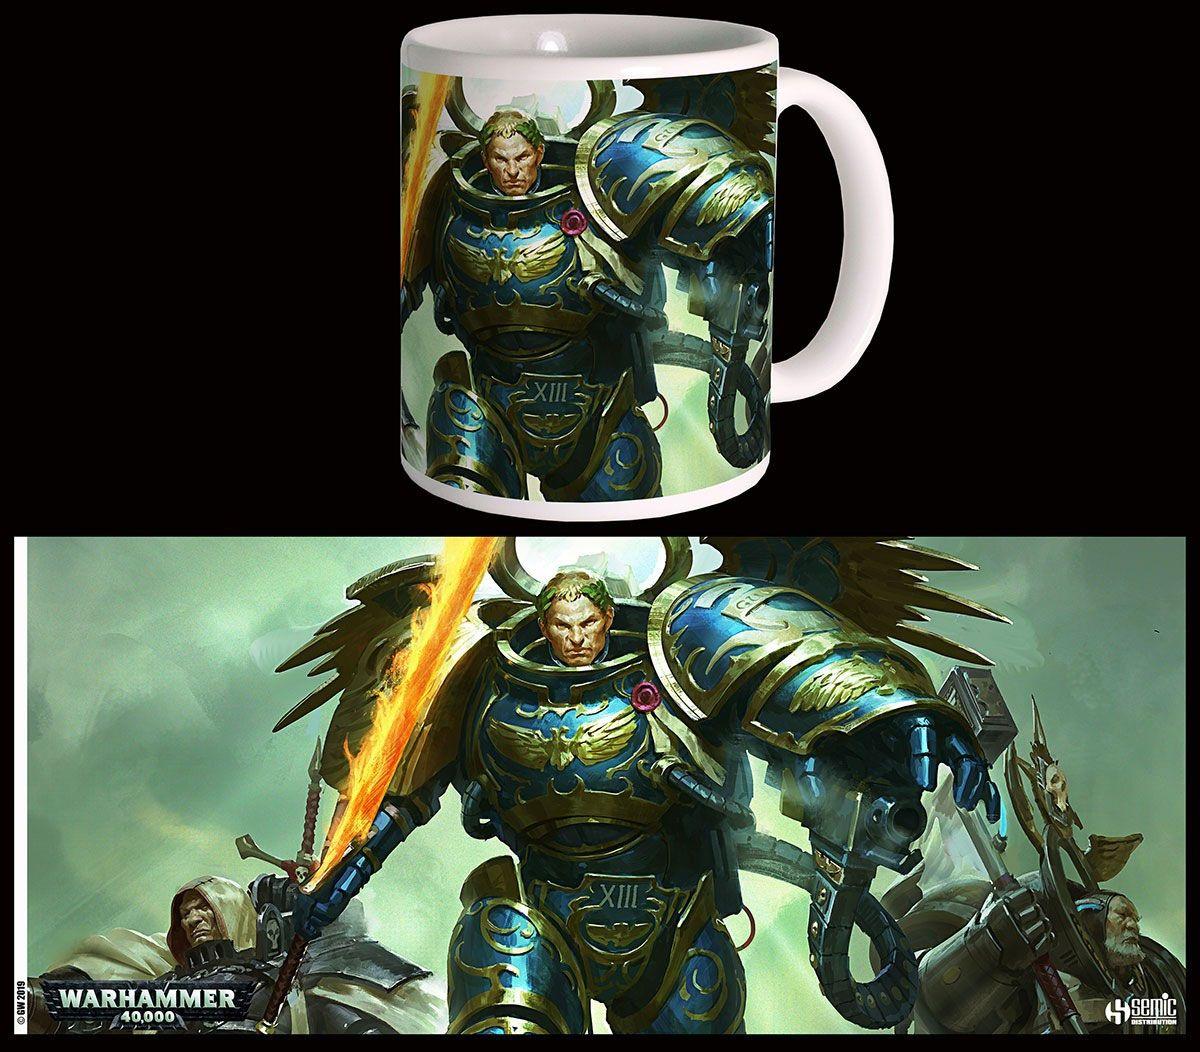 Warhammer 40K Mug Roboute Guilliman